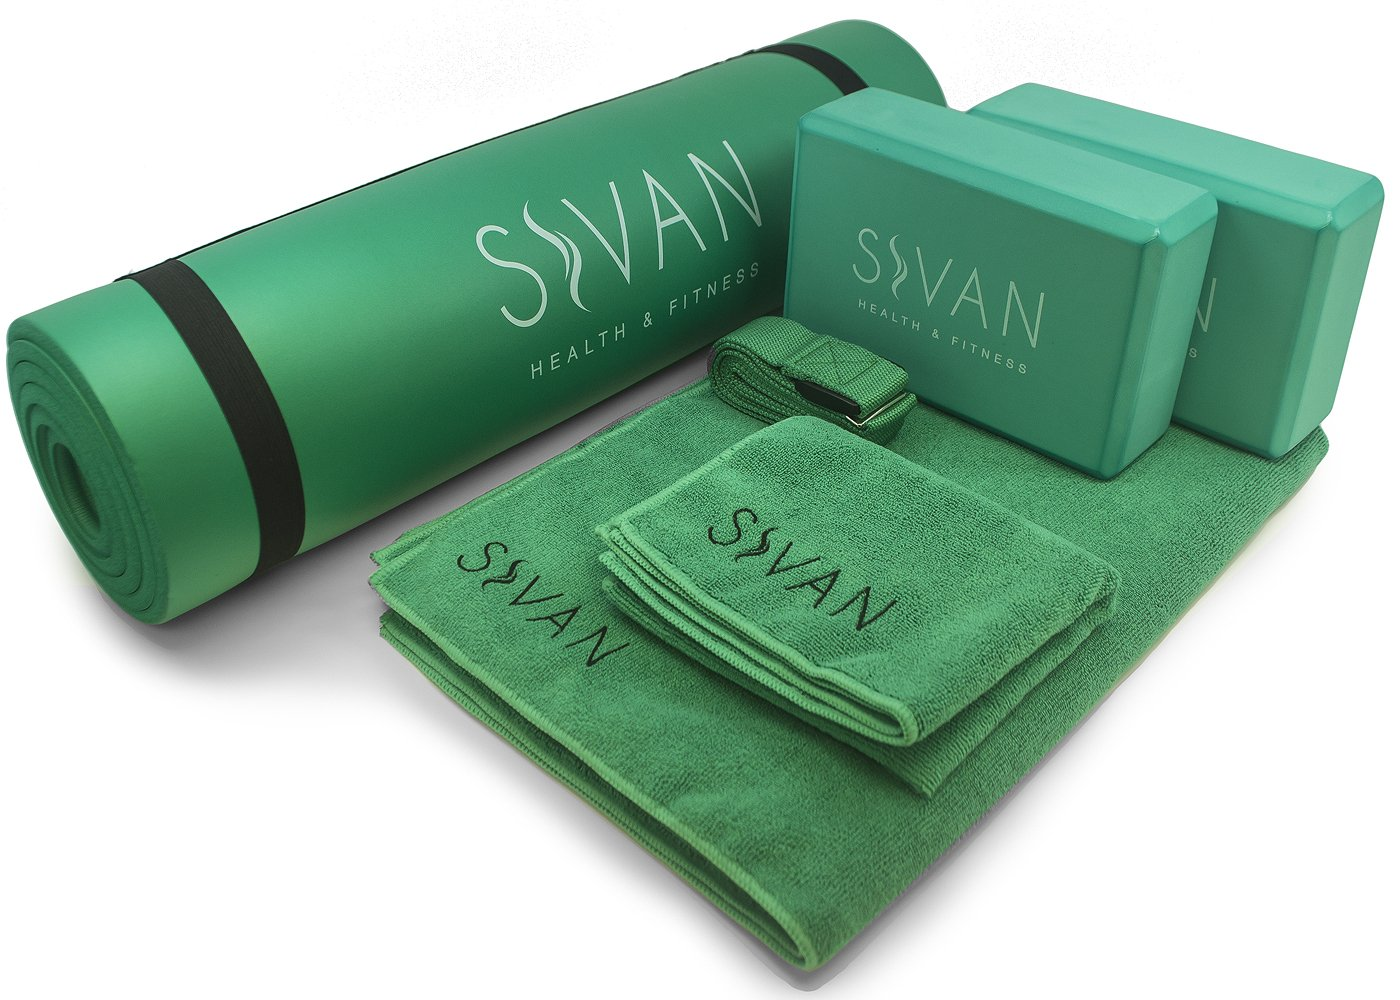 Sivan 6-Piece Yoga Set- Includes 1/2'' Ultra Thick NBR Exercise Mat, 2 Yoga Blocks, 1 Yoga Mat Towel, 1 Yoga Hand Towel and a Yoga Strap (Green)